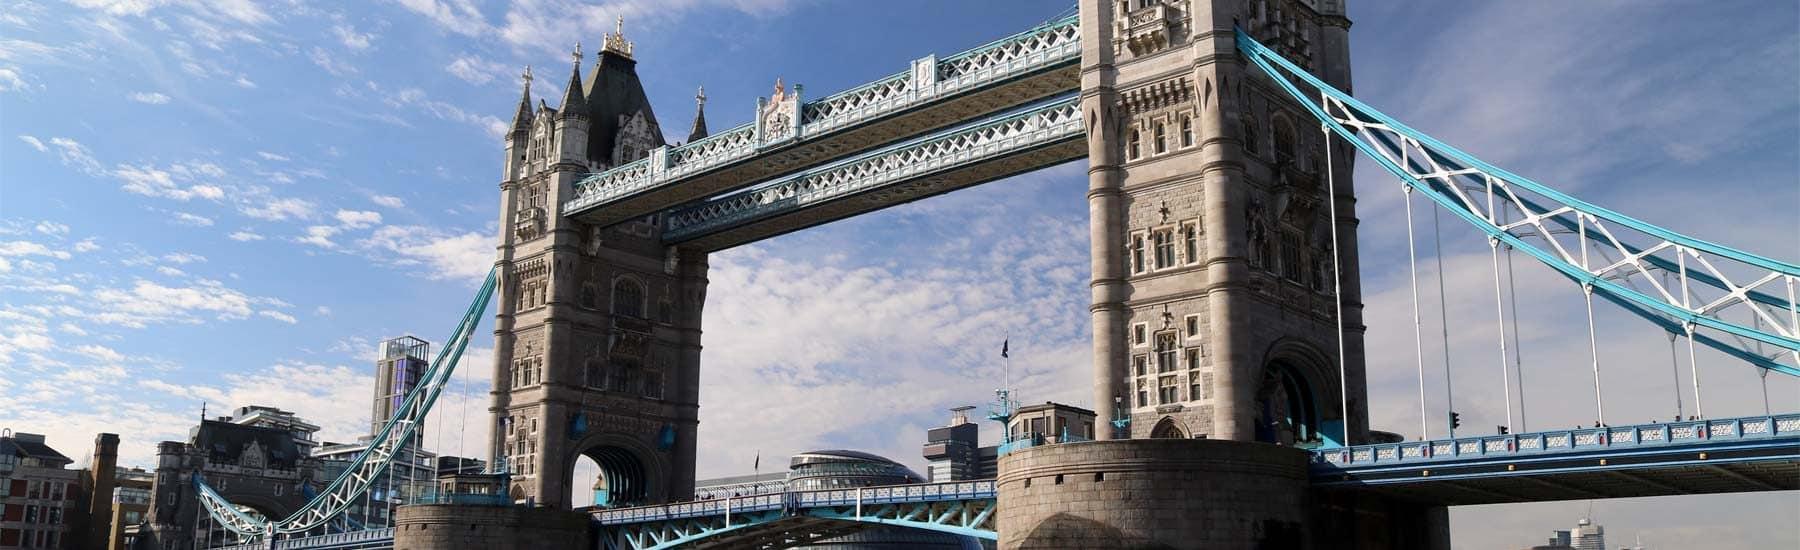 Thames River Sightseeing, Tower Bridge